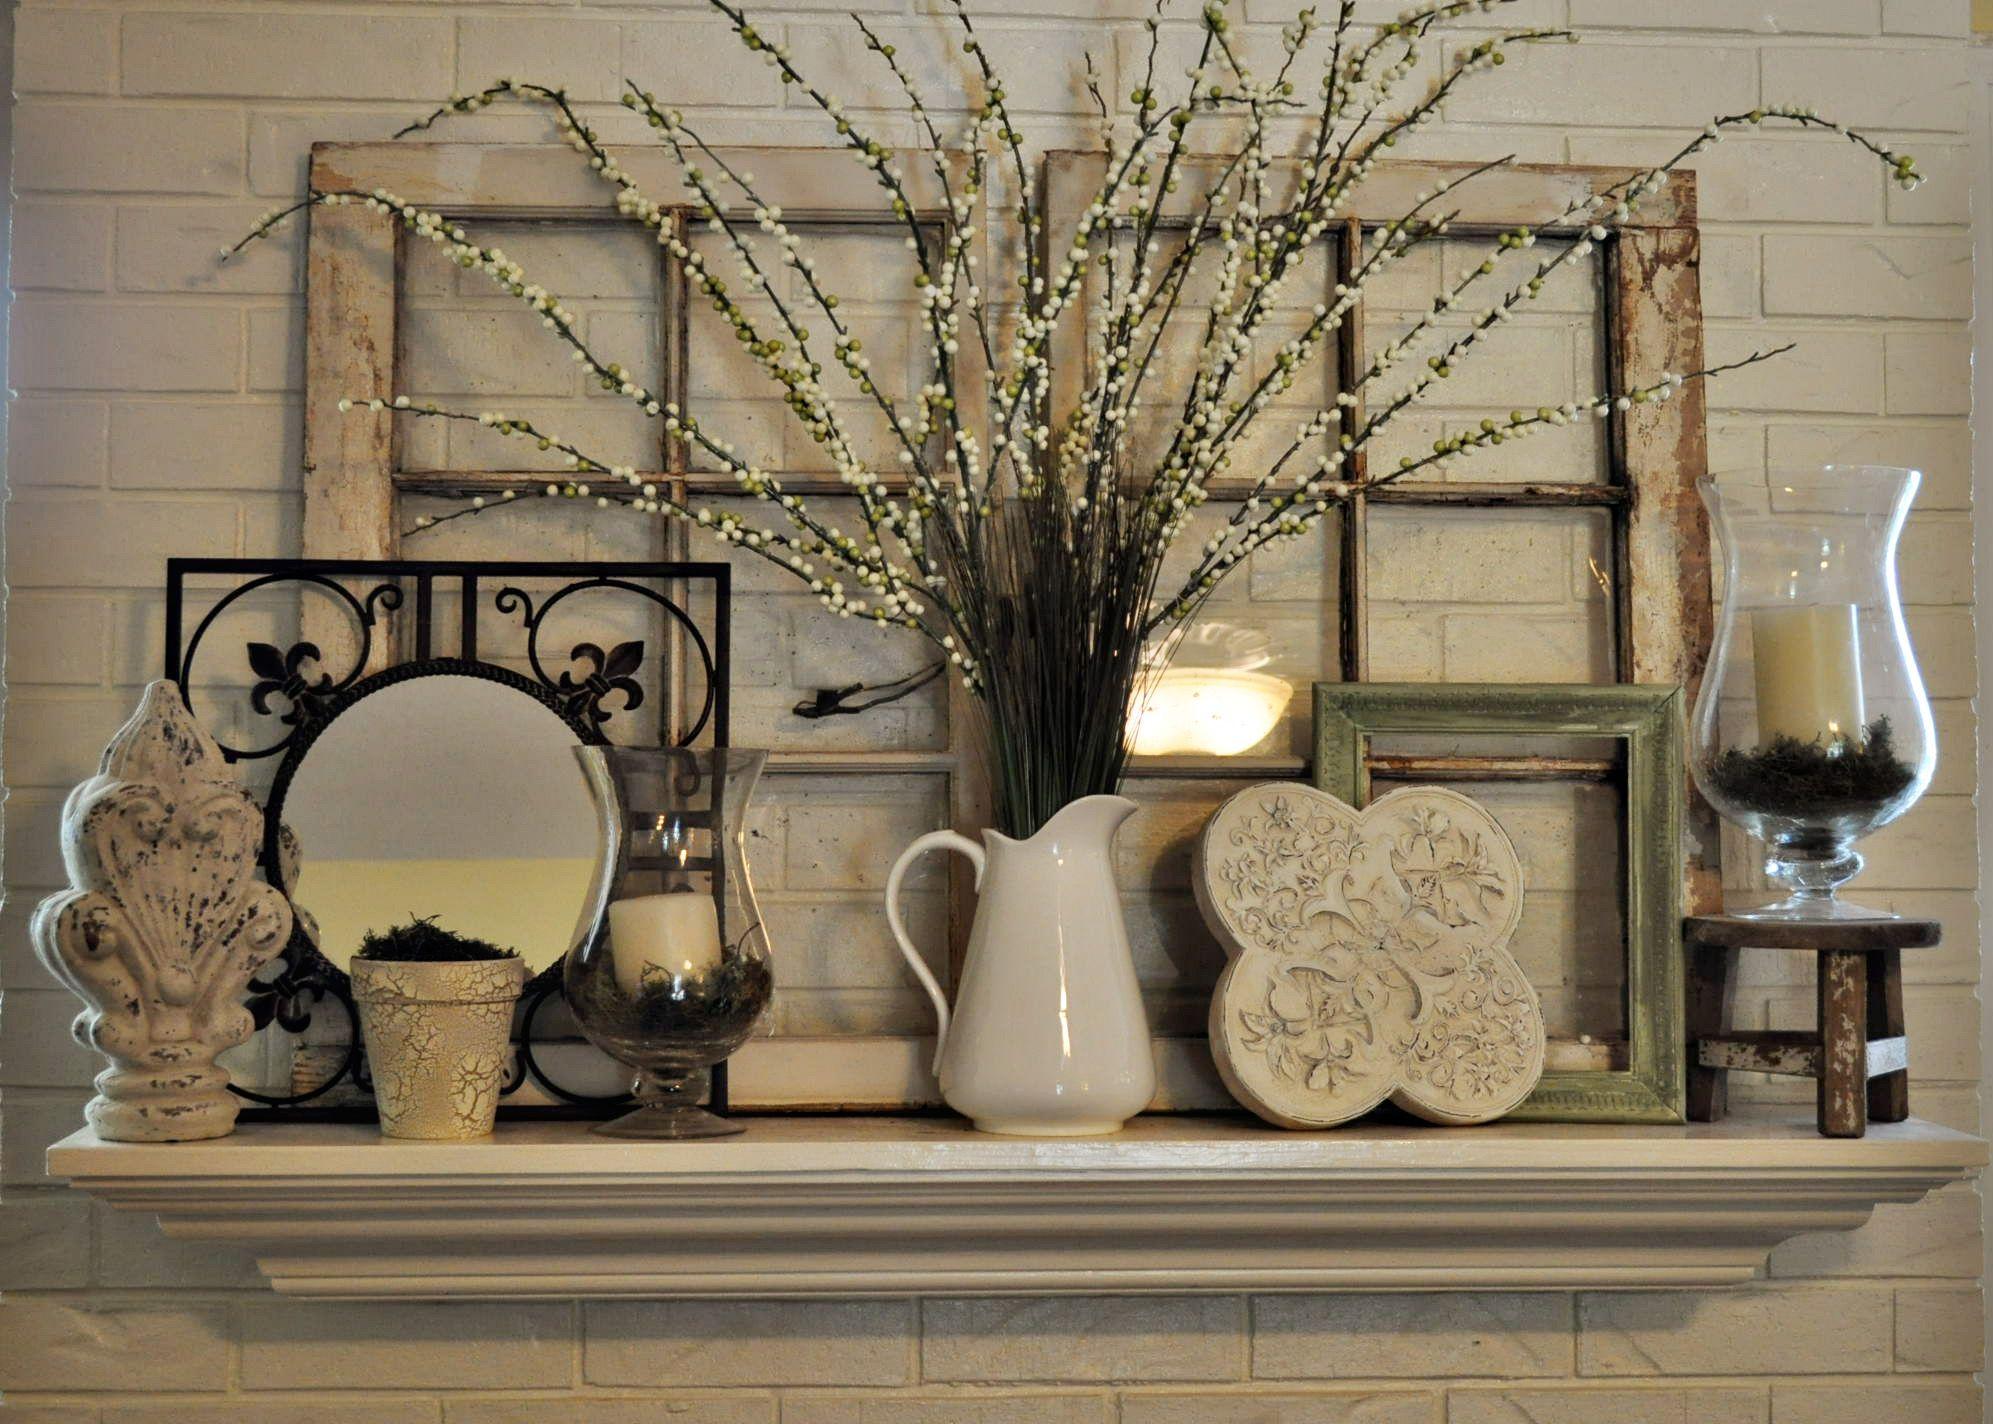 decorating a mantel or shelf decor in 2019 home decor fireplace mantels vintage home decor. Black Bedroom Furniture Sets. Home Design Ideas